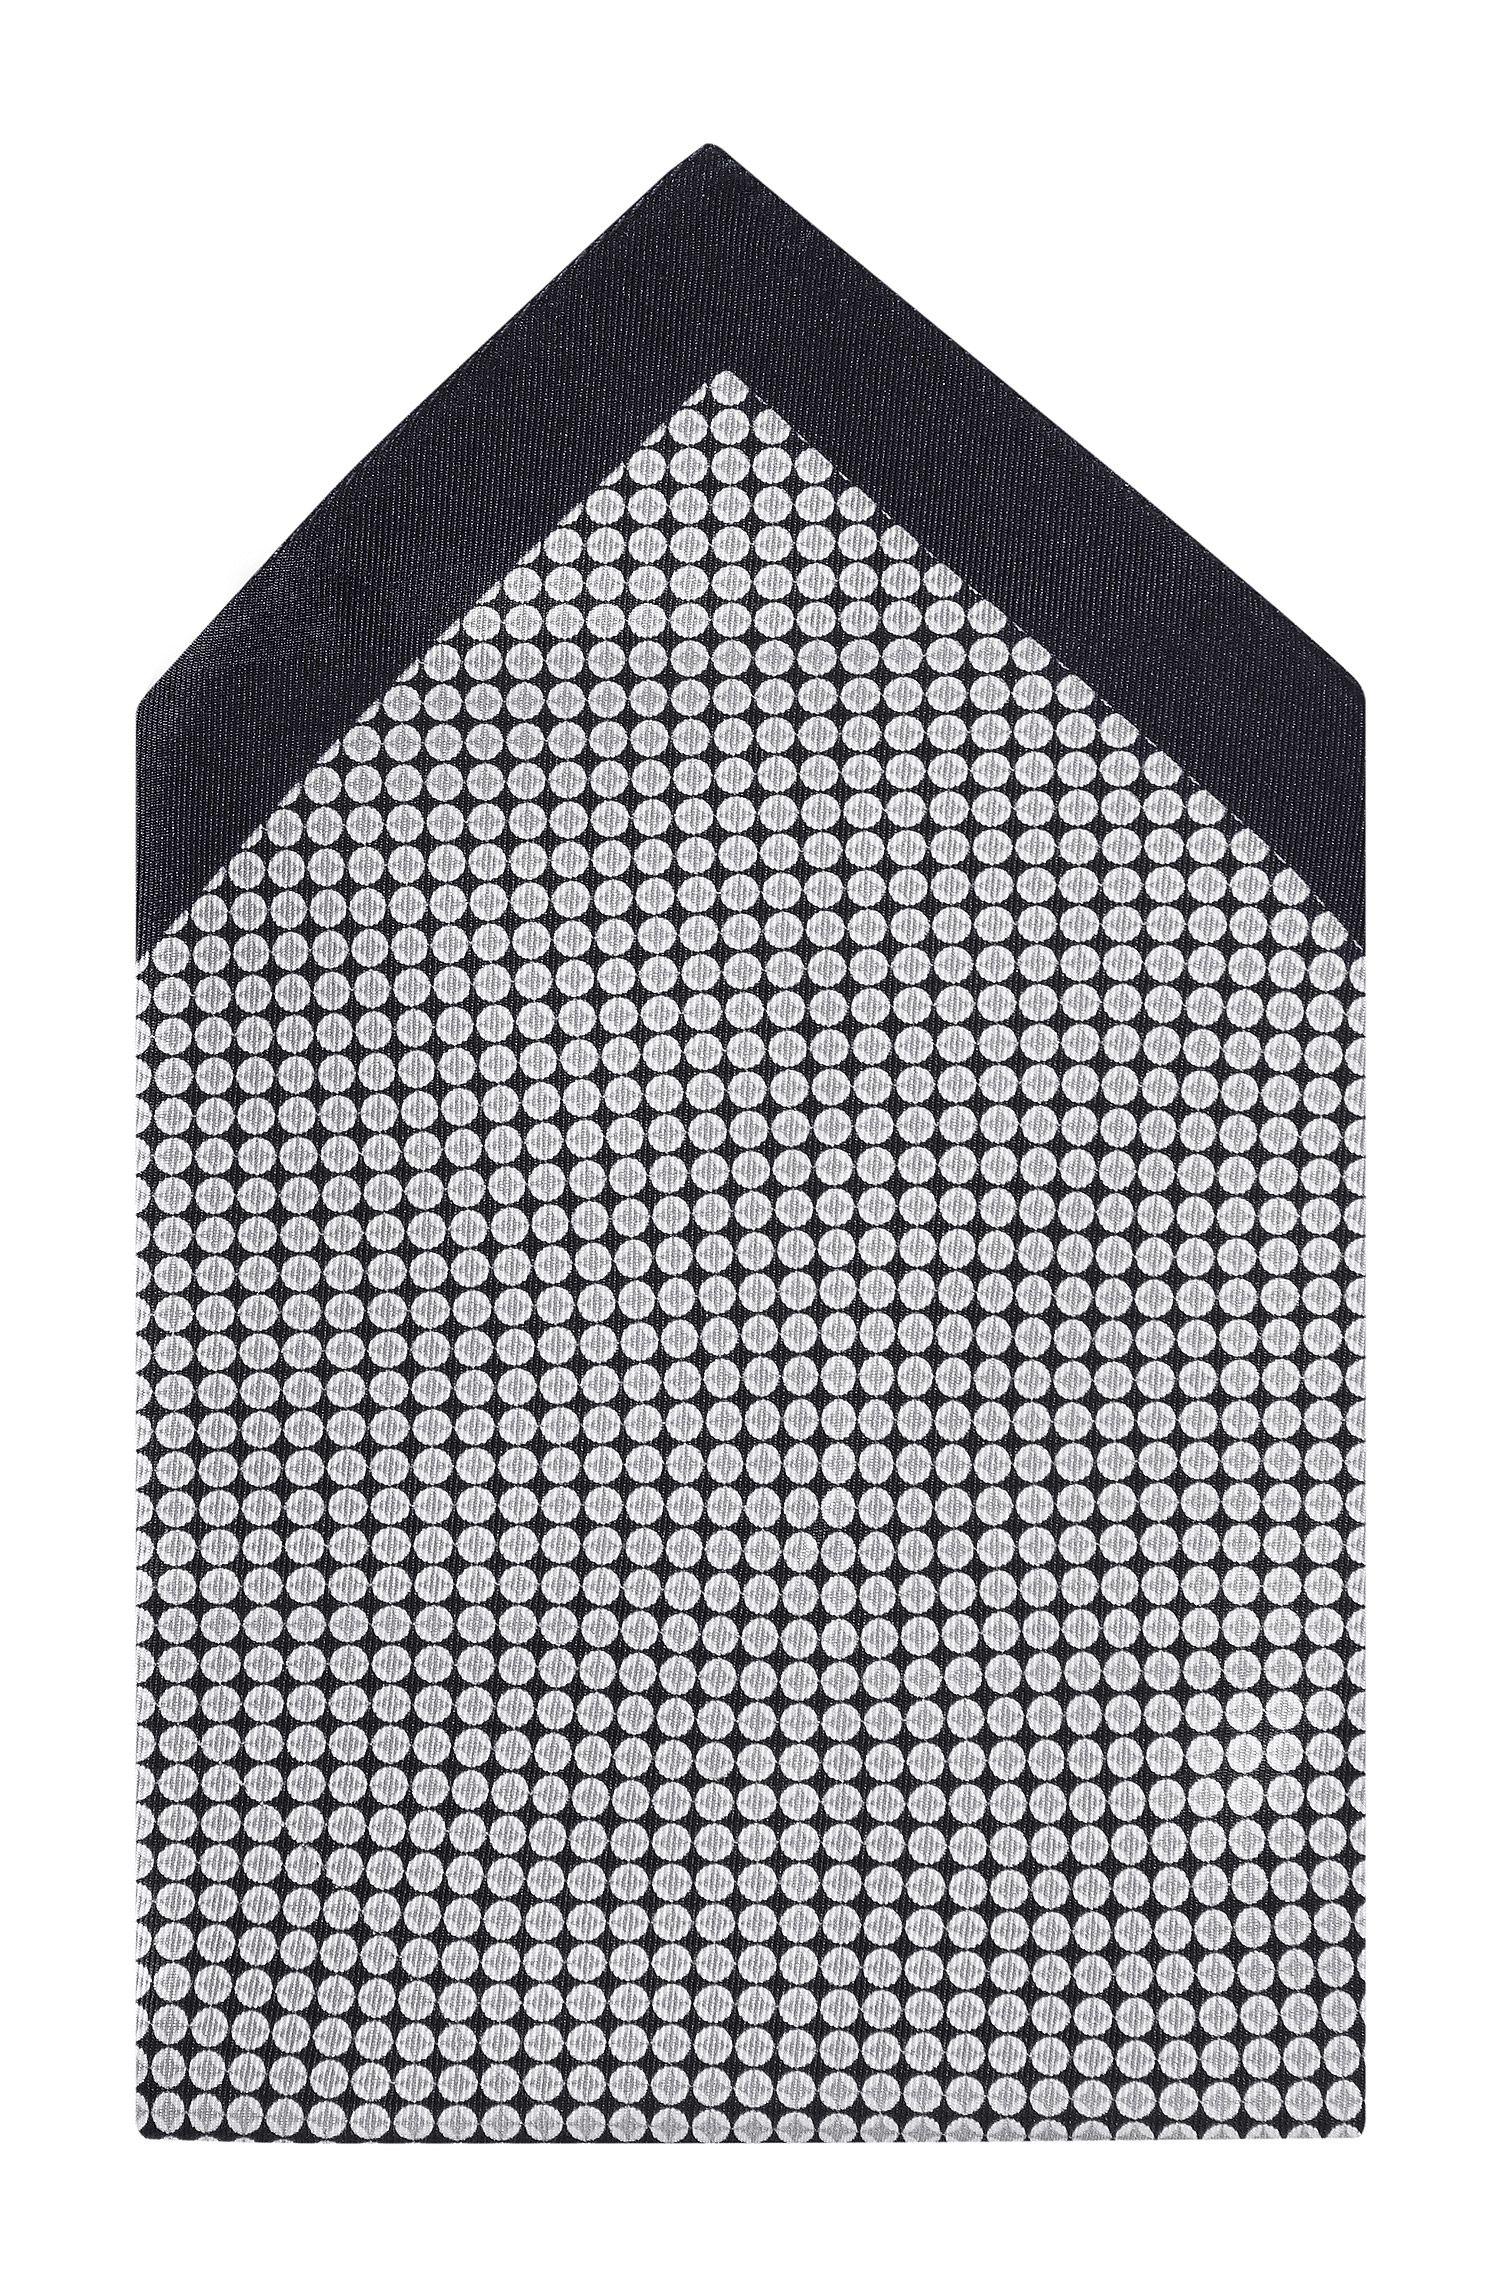 Pochette «Pocket square 33x33» en soie